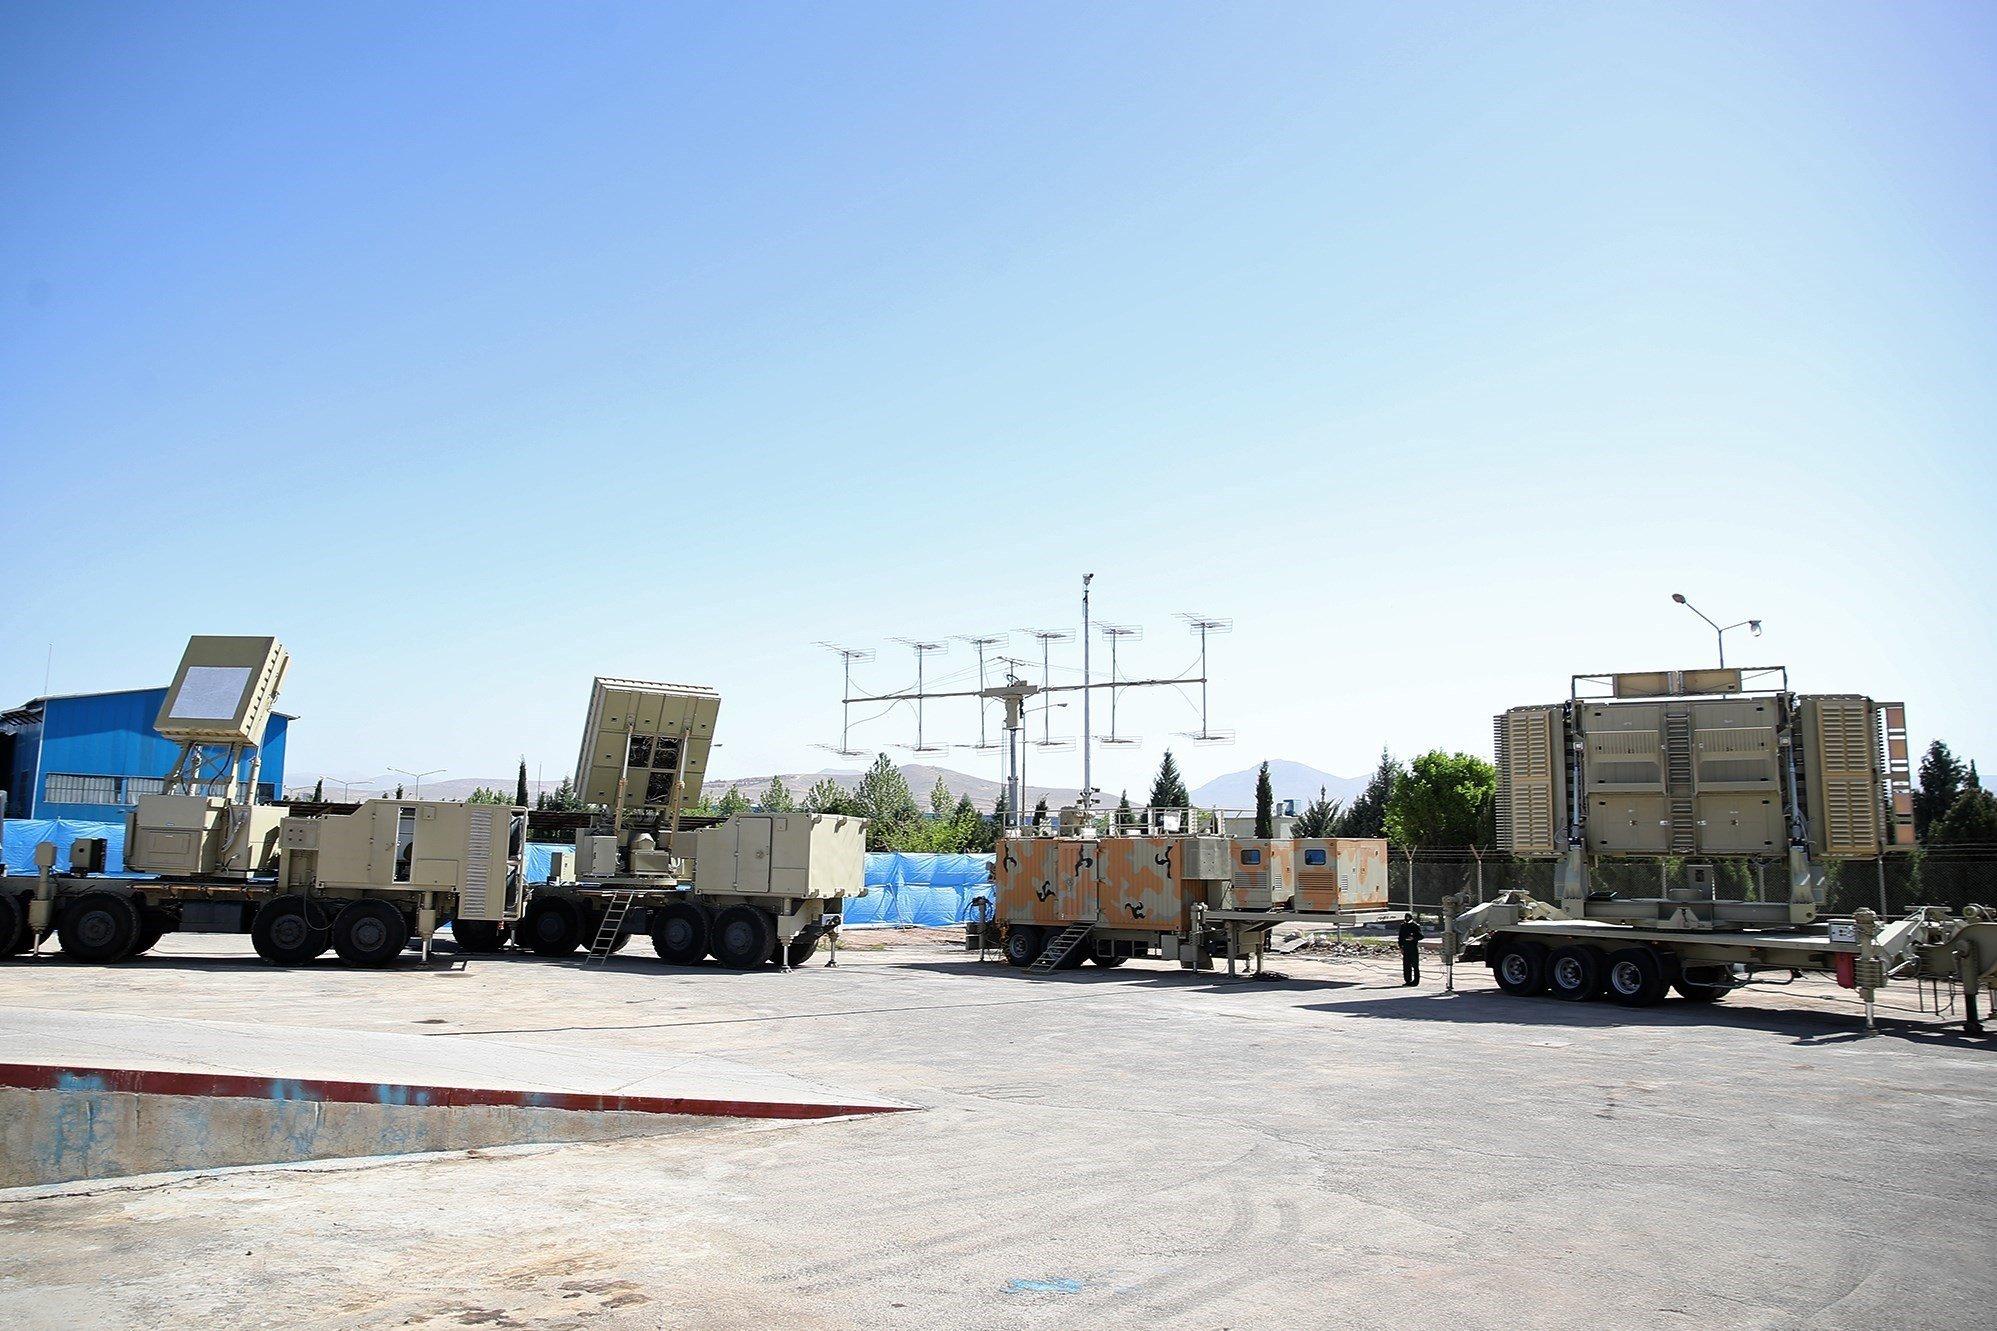 إيران اعلنت عن مواصفات باور 373 13960131140045121105862610